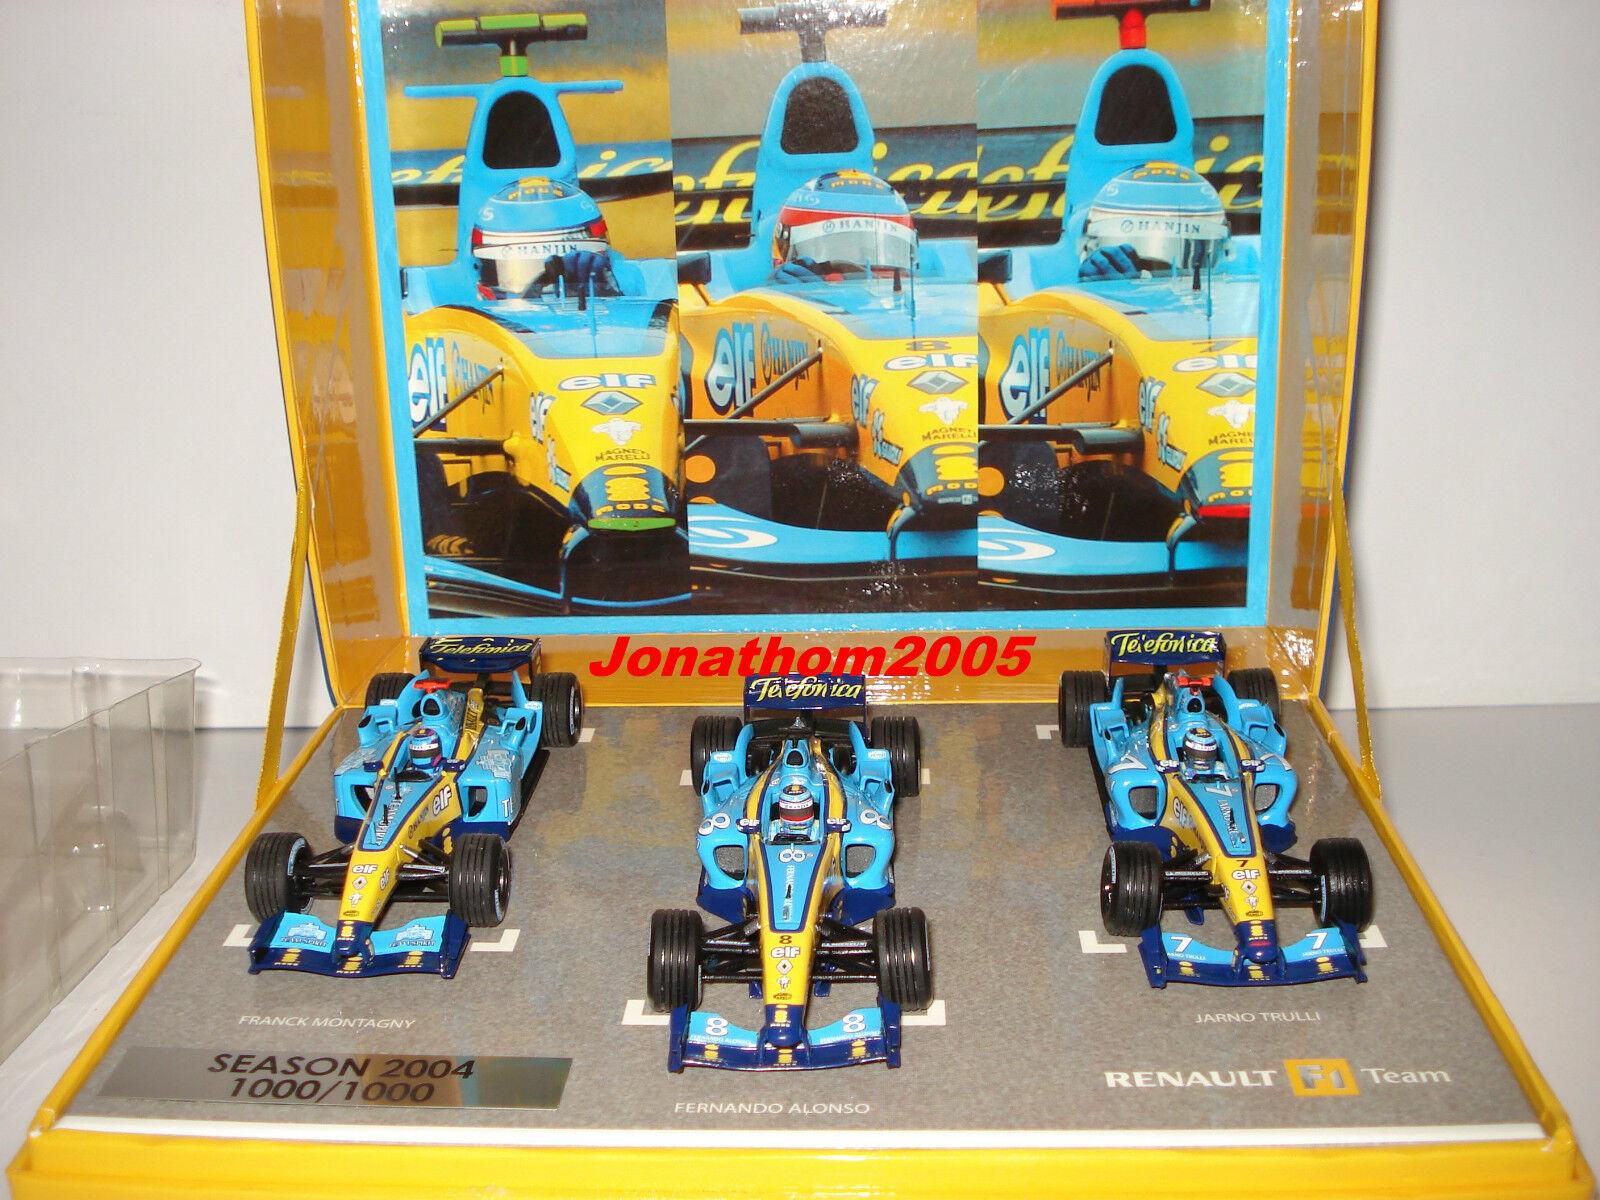 COFFRET NOREV RENAULT F1 TEAM 2004 N° 1000 1000 - 3 F1    ALONSO MONTAGNY TRULLI